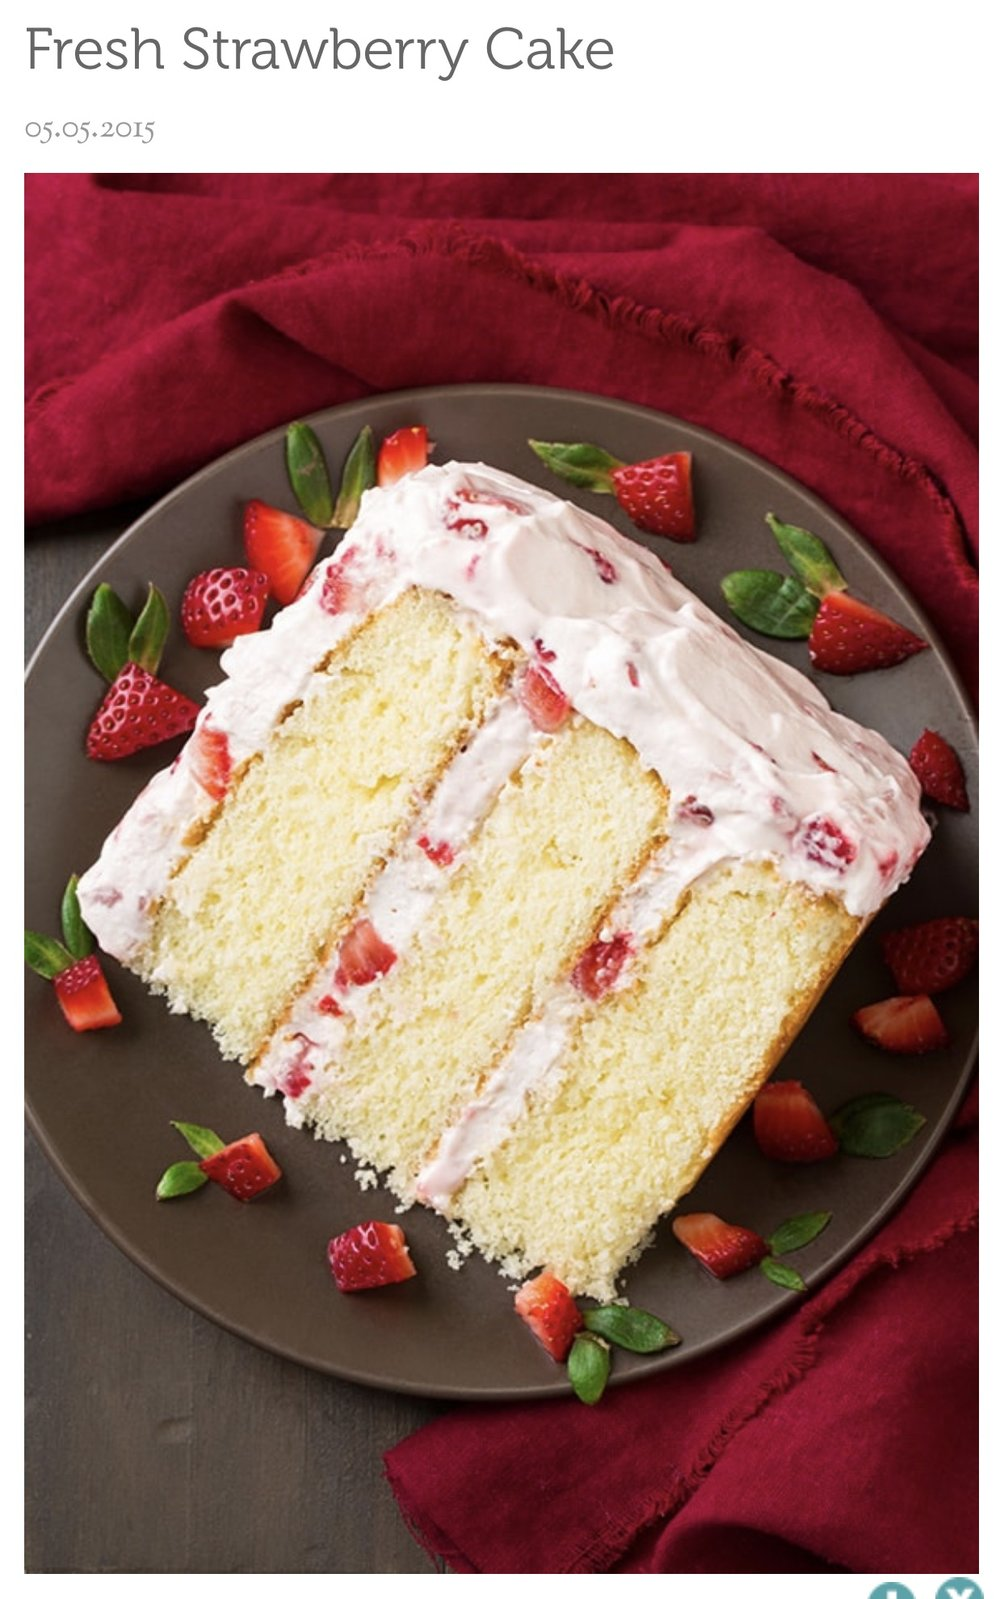 Stawberry Cake.jpg